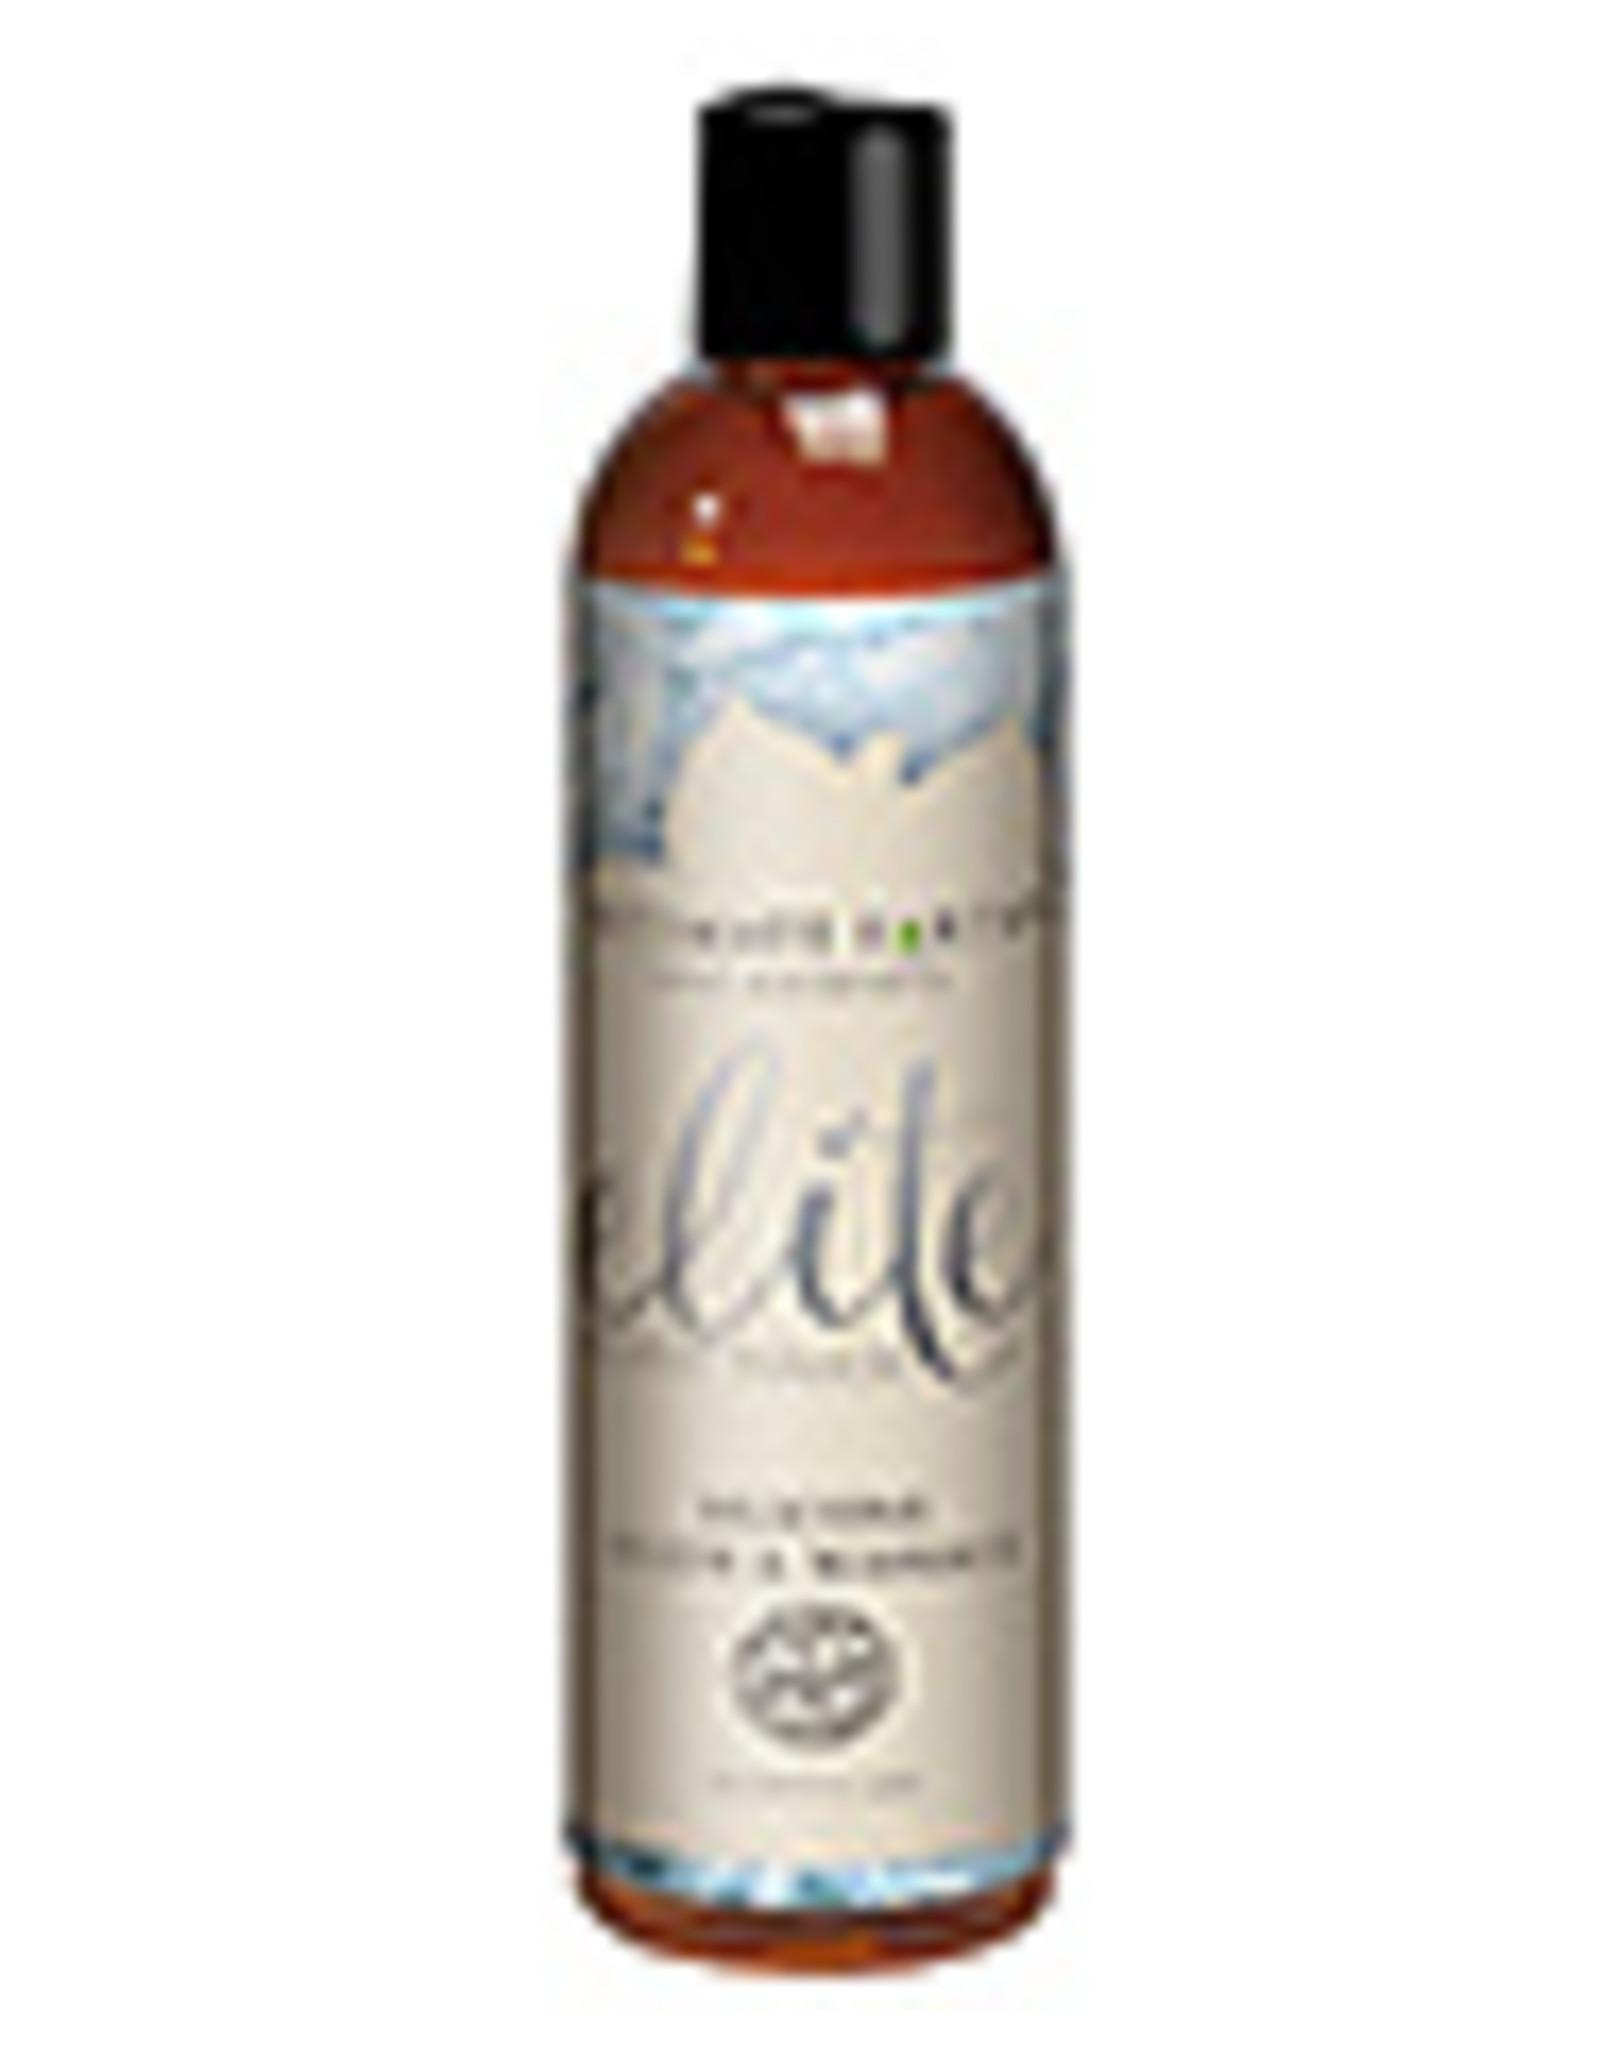 Intimate Earth Elite Velvet Touch Silicone Glide & Massage Oil - 120ml